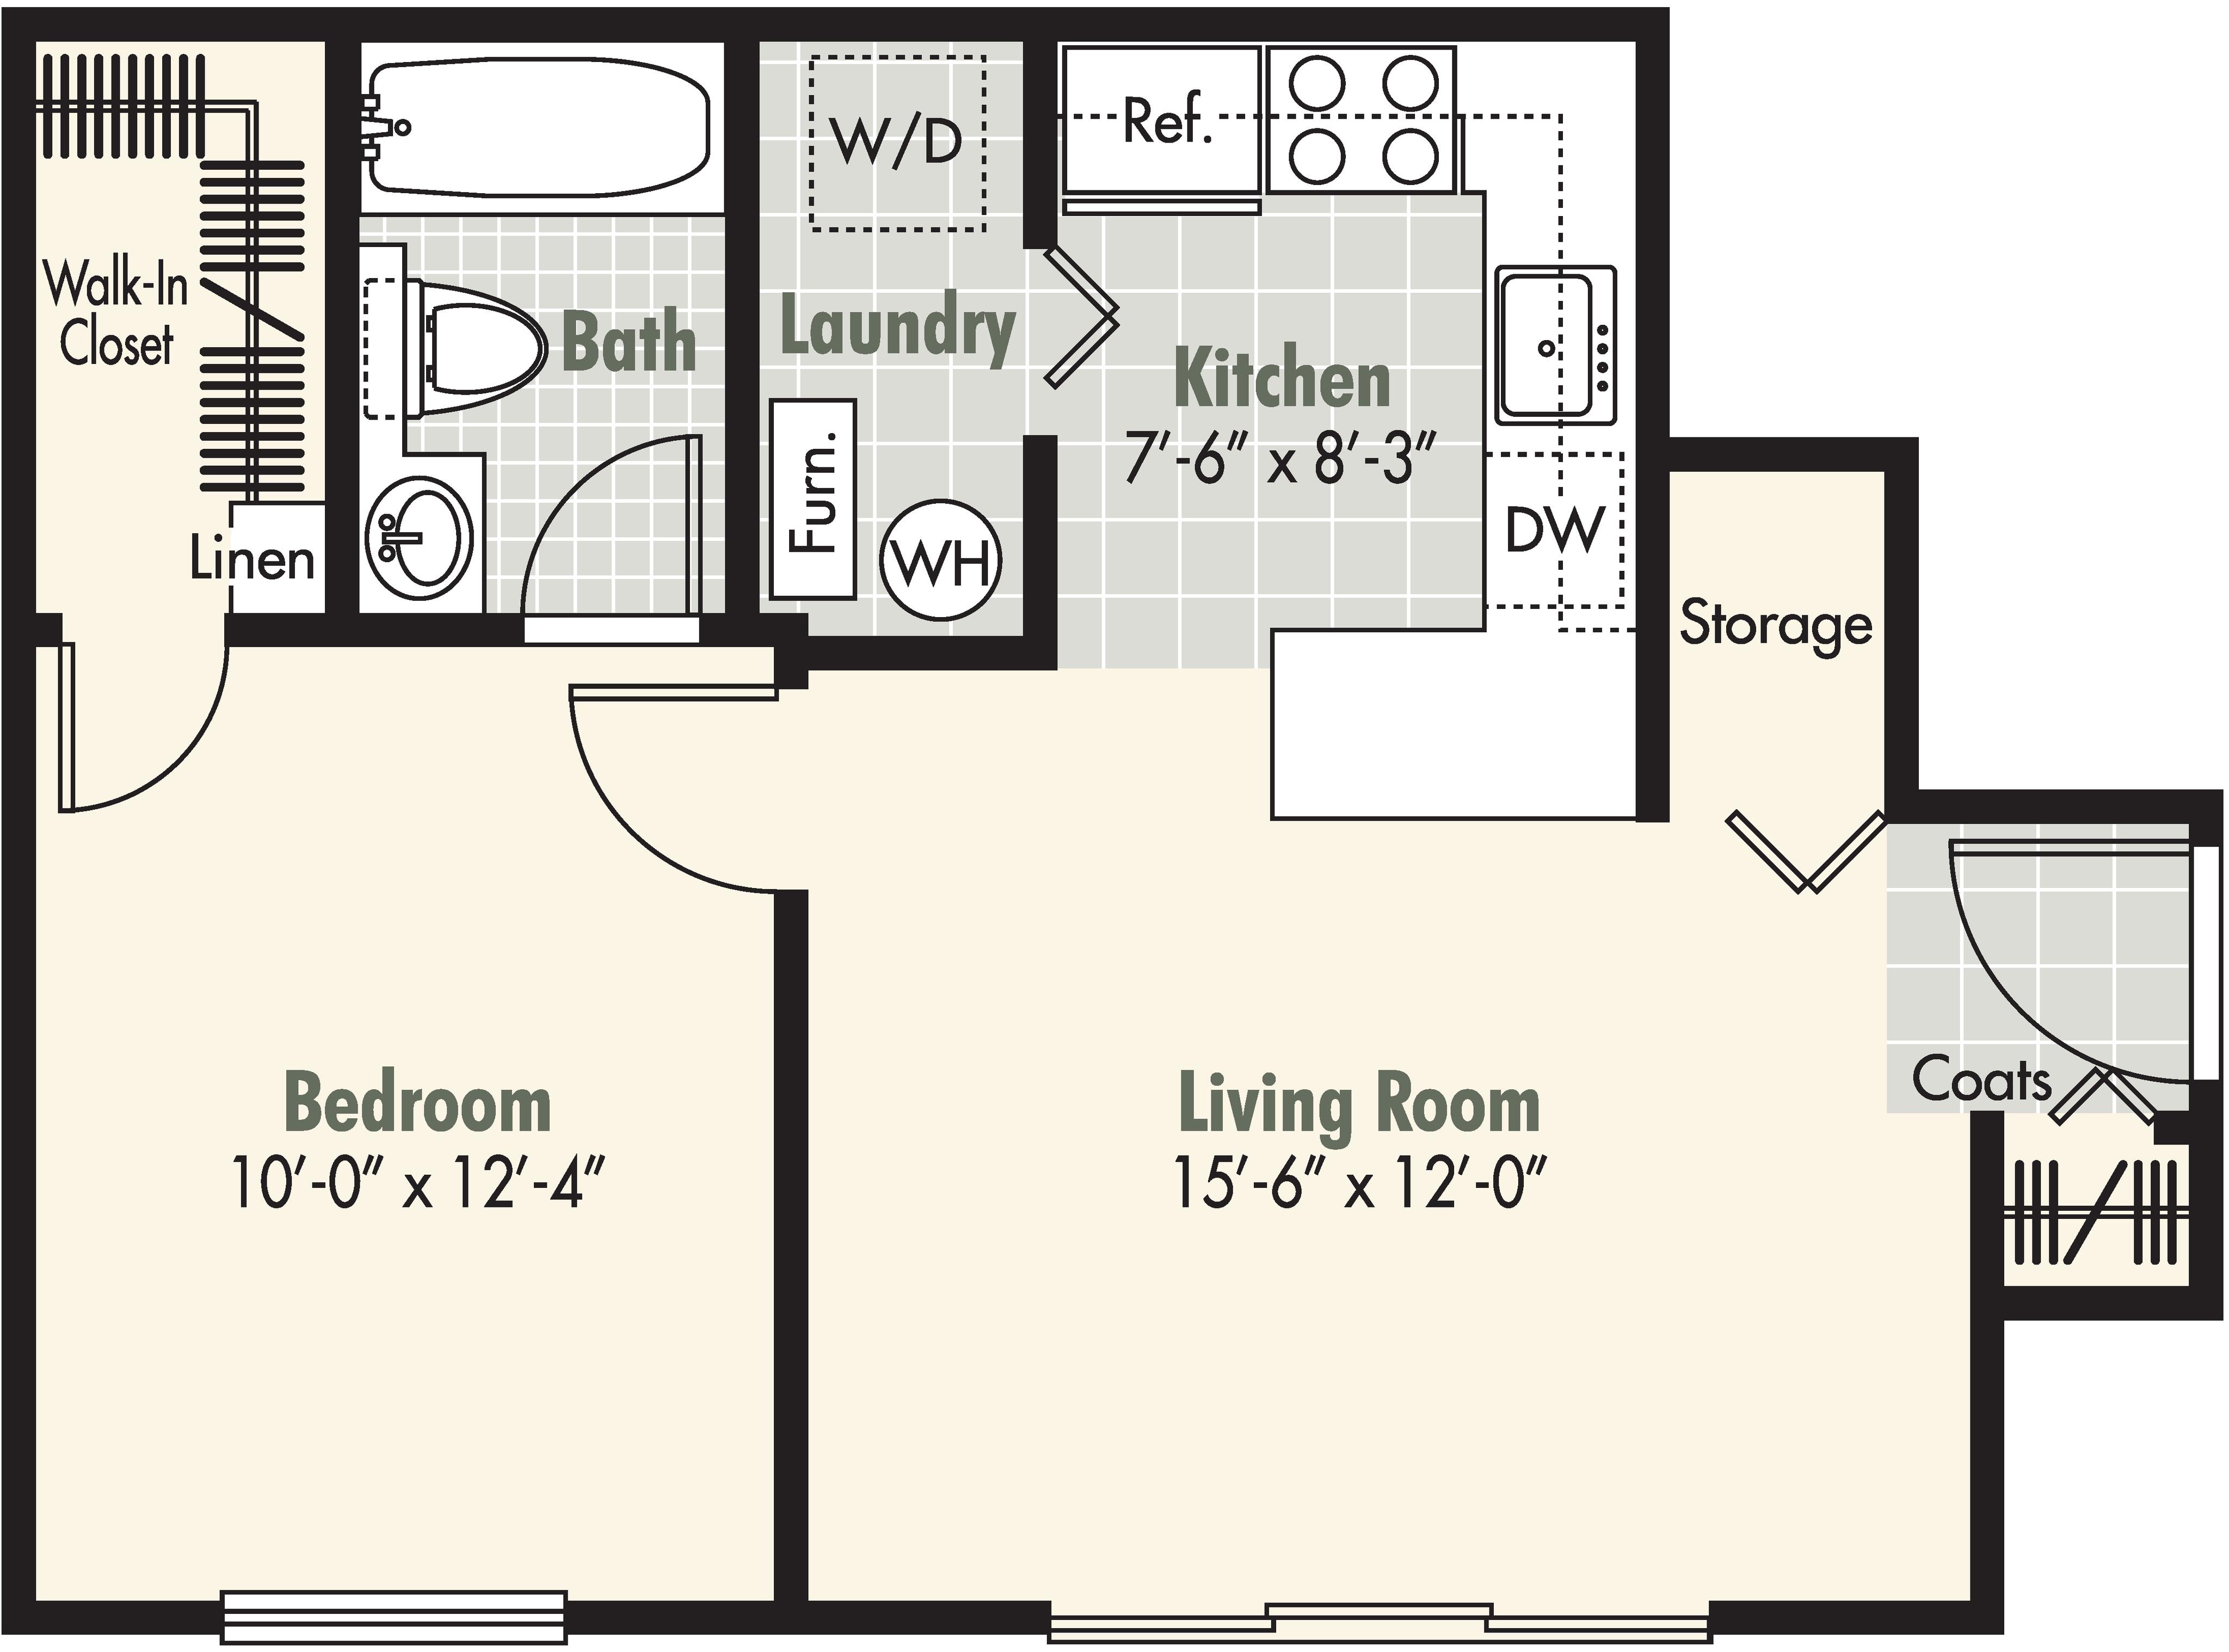 1 Bedroom - 1 Bath